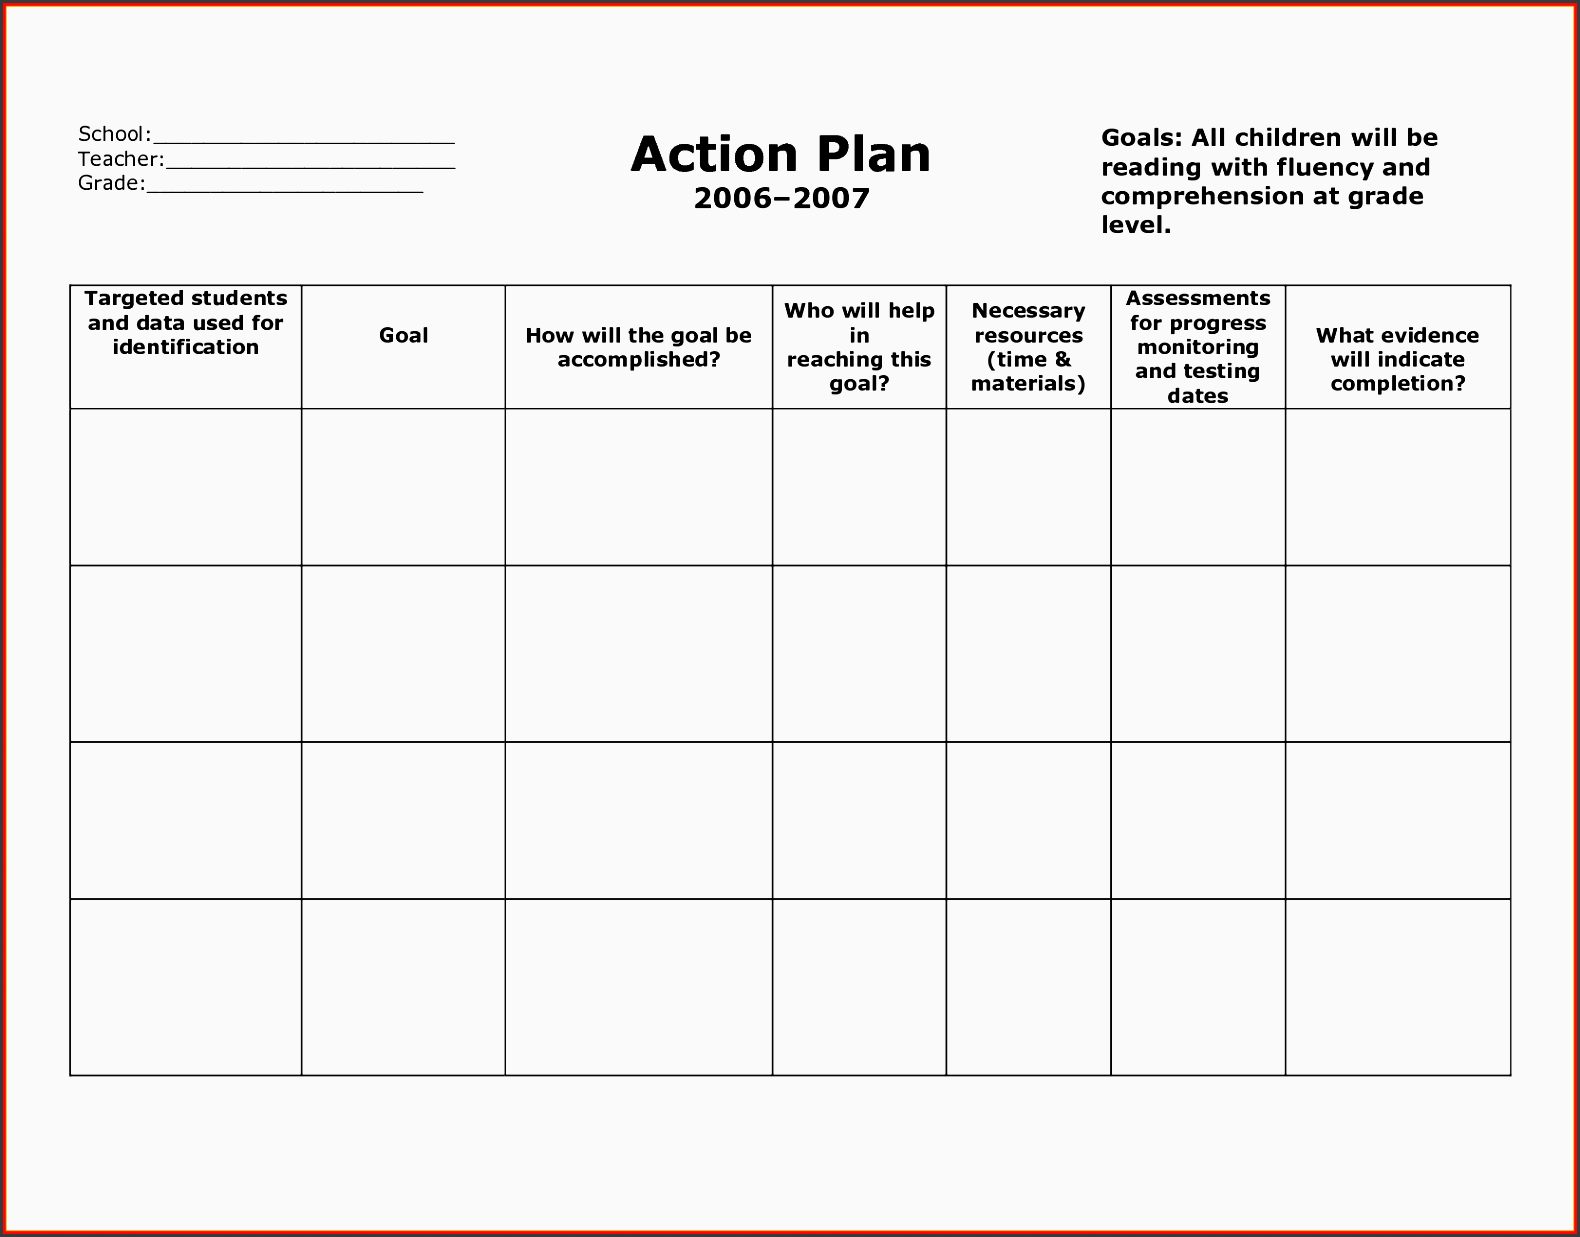 stunning general action plan template word examples efficient action plan template word sample for school